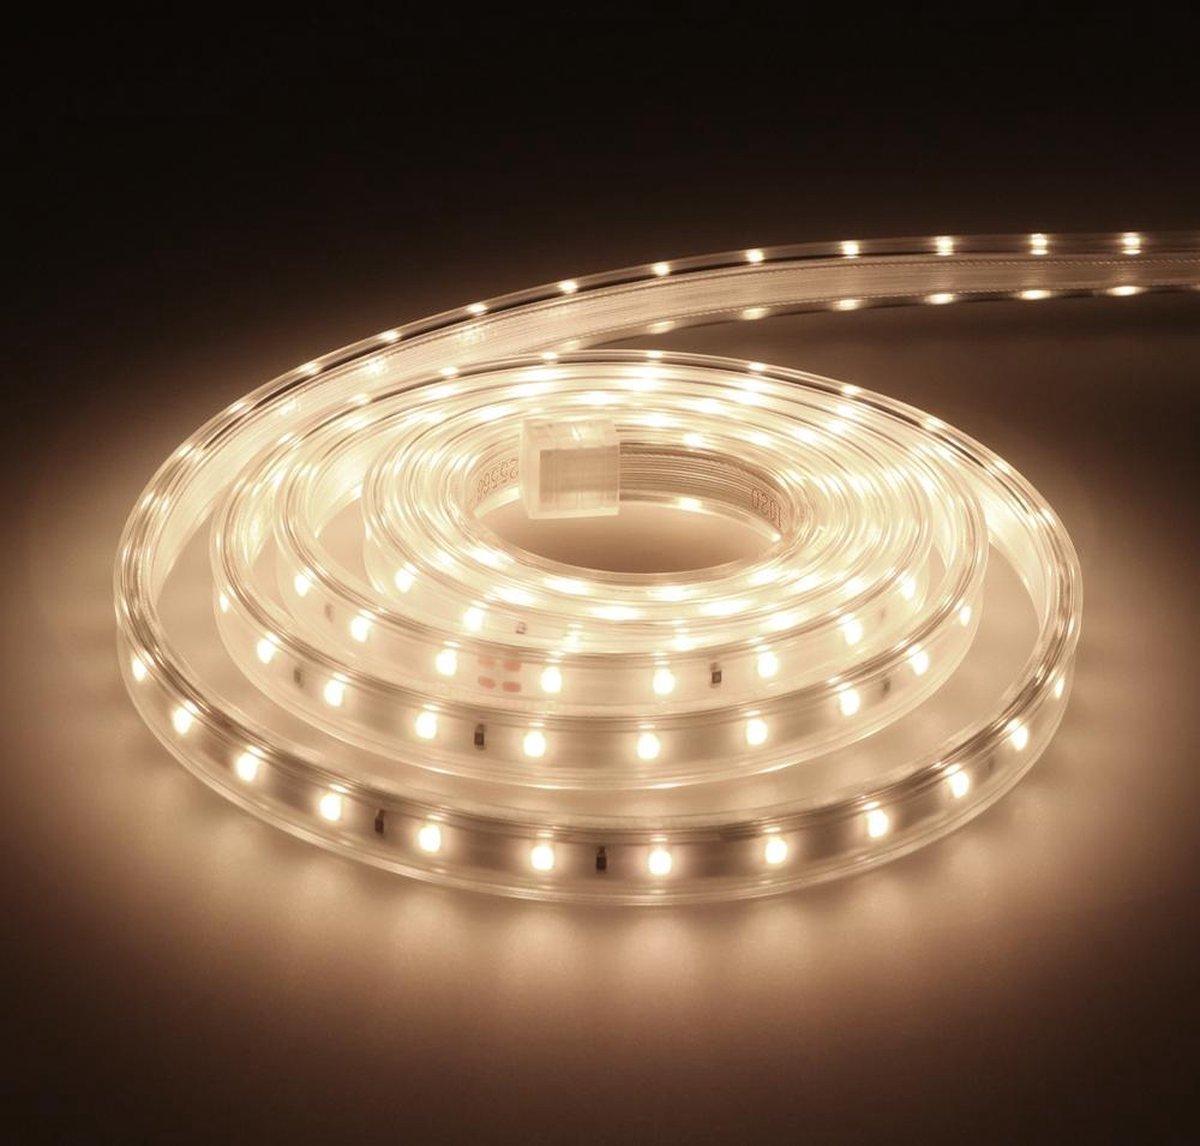 Dimbare LED Strip 2m 4000K 60 LEDs/m IP65 Plug & Play - Flex60 Series